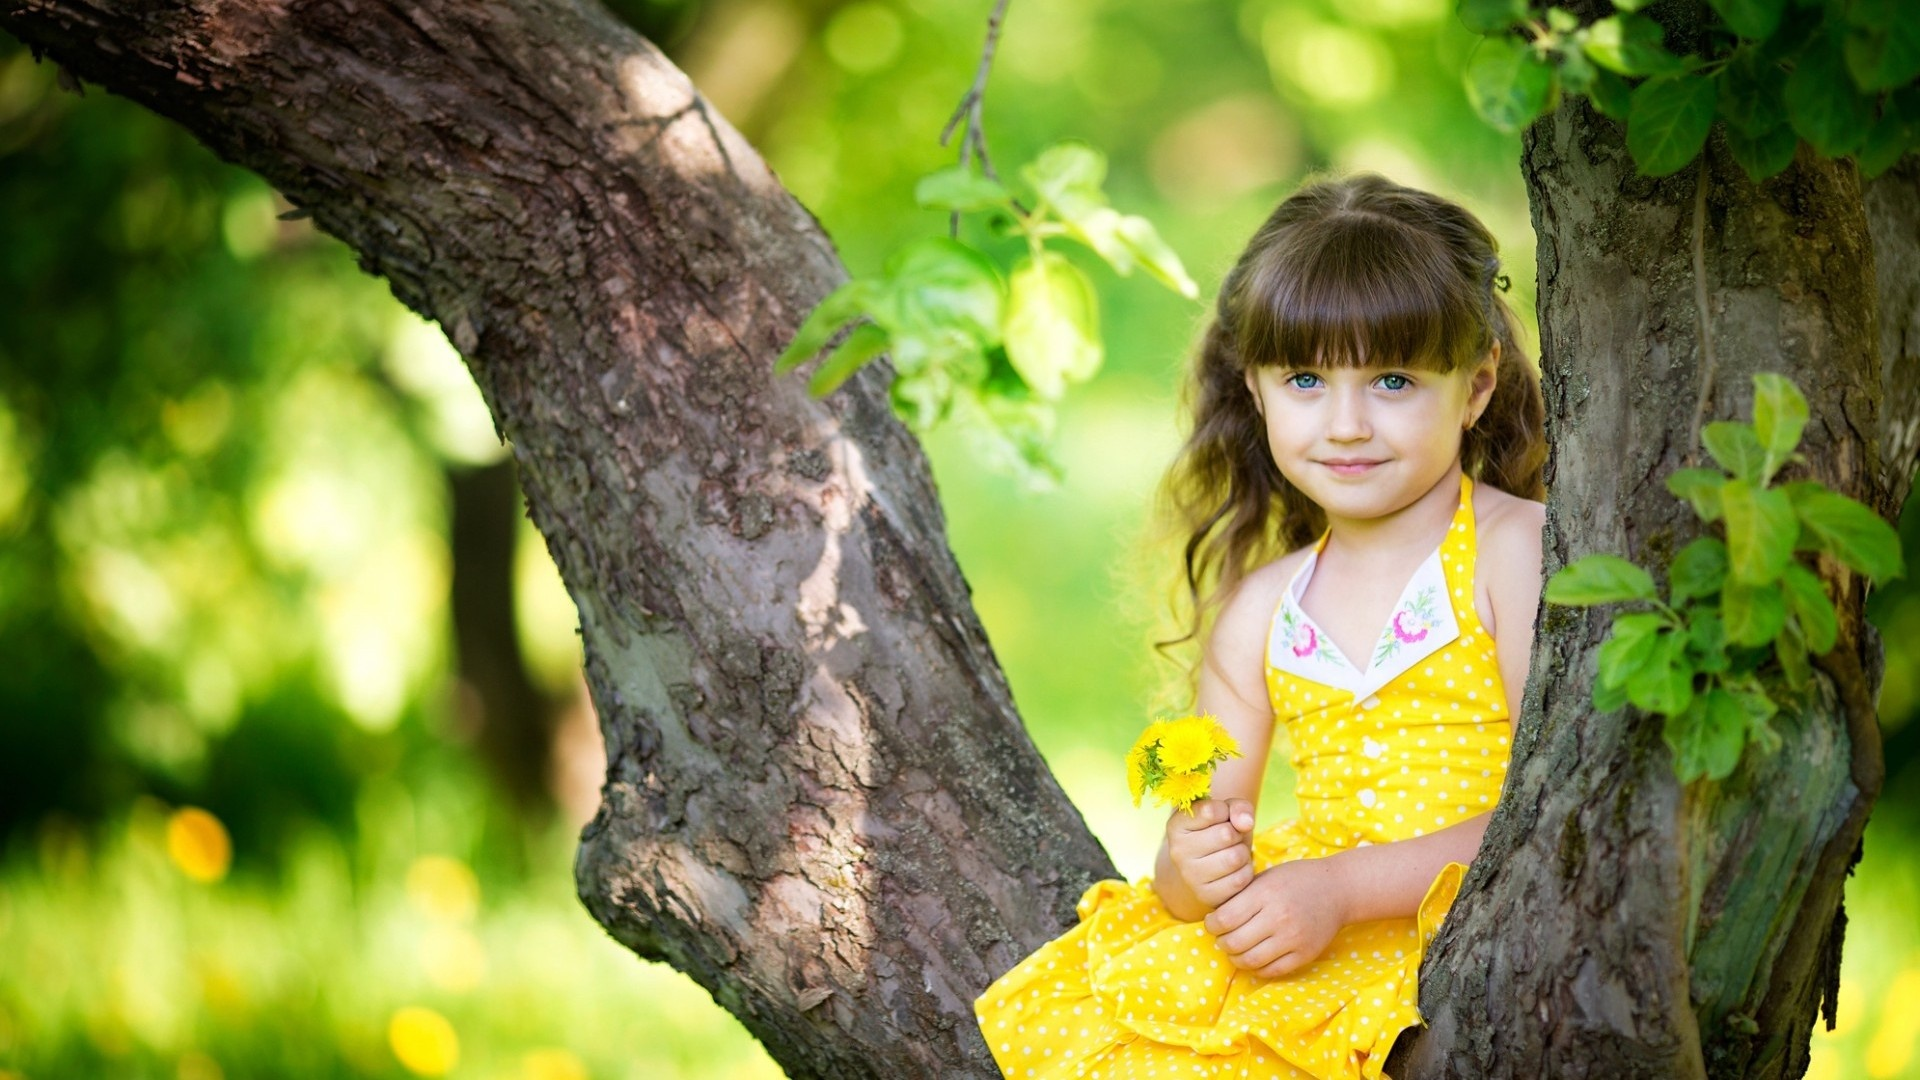 Cute Baby Girl Wallpaper HD Free Download